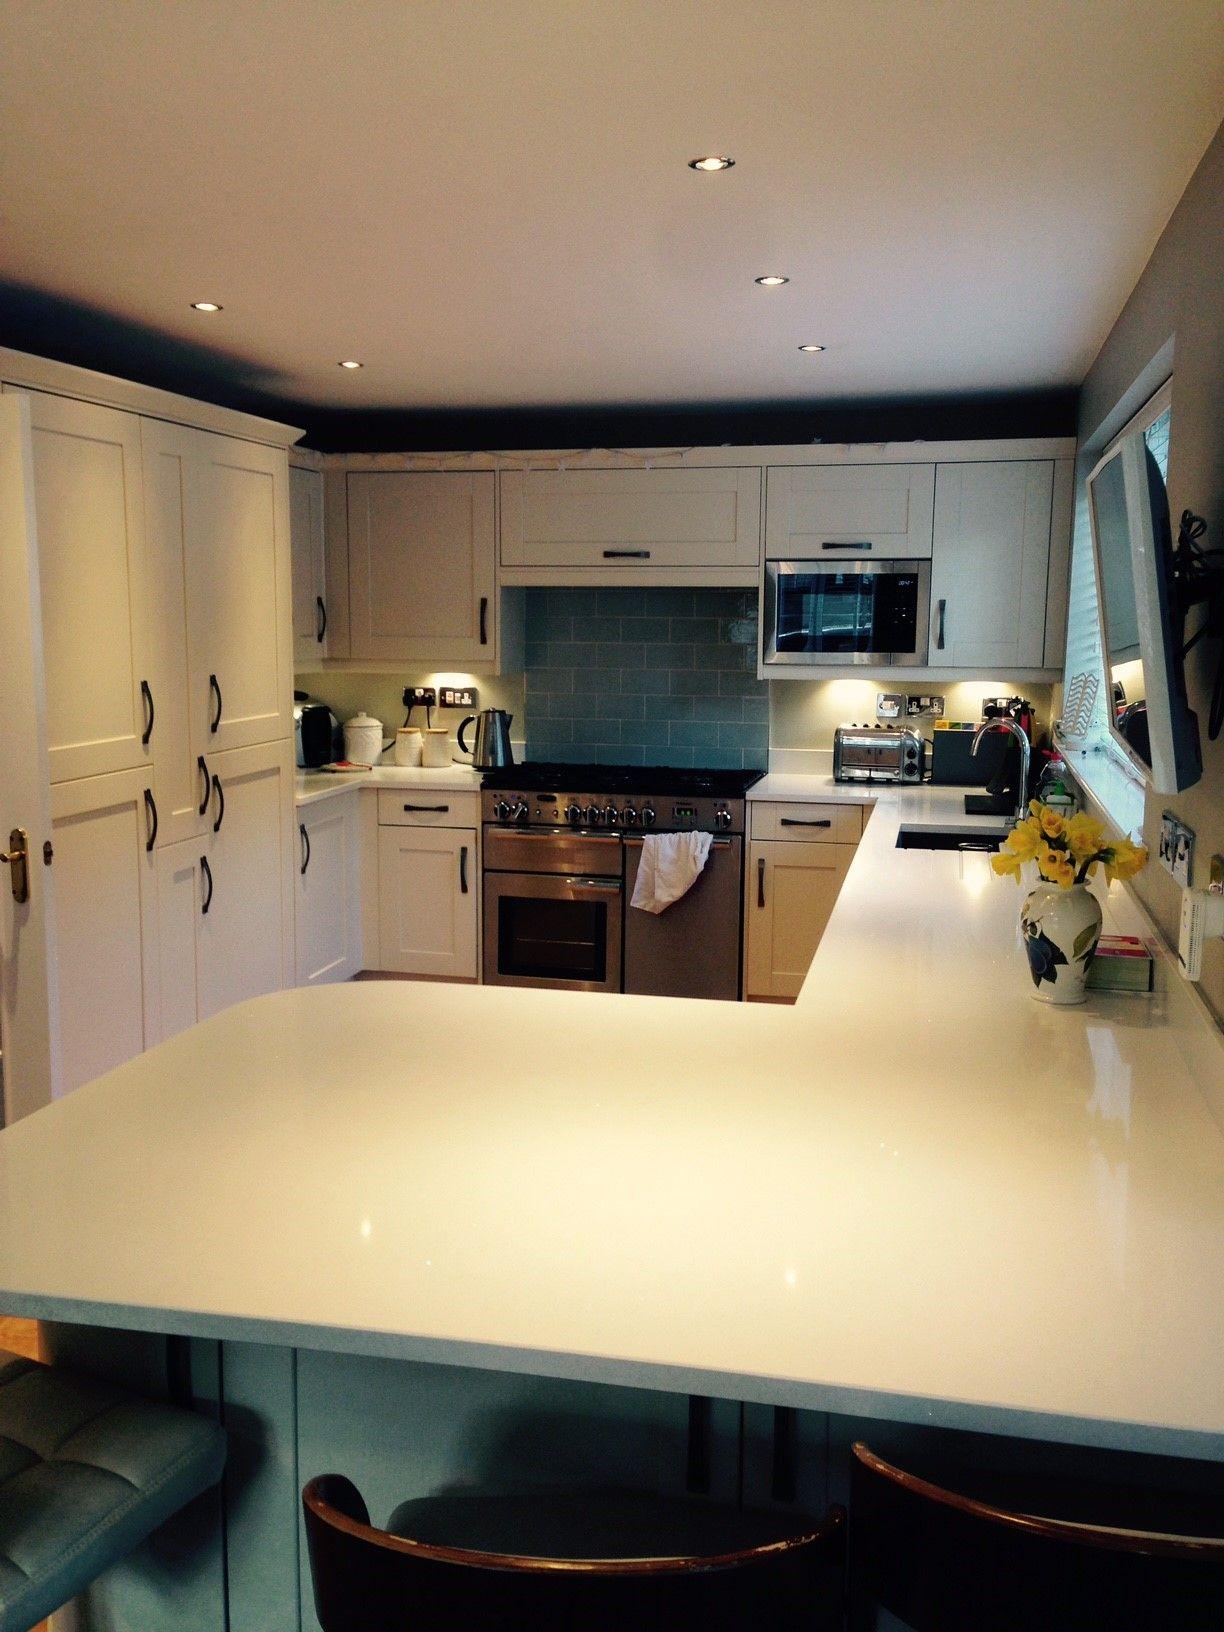 wren kitchens shaker alabaster timber and shaker cream matt the dream traditional combo we. Black Bedroom Furniture Sets. Home Design Ideas